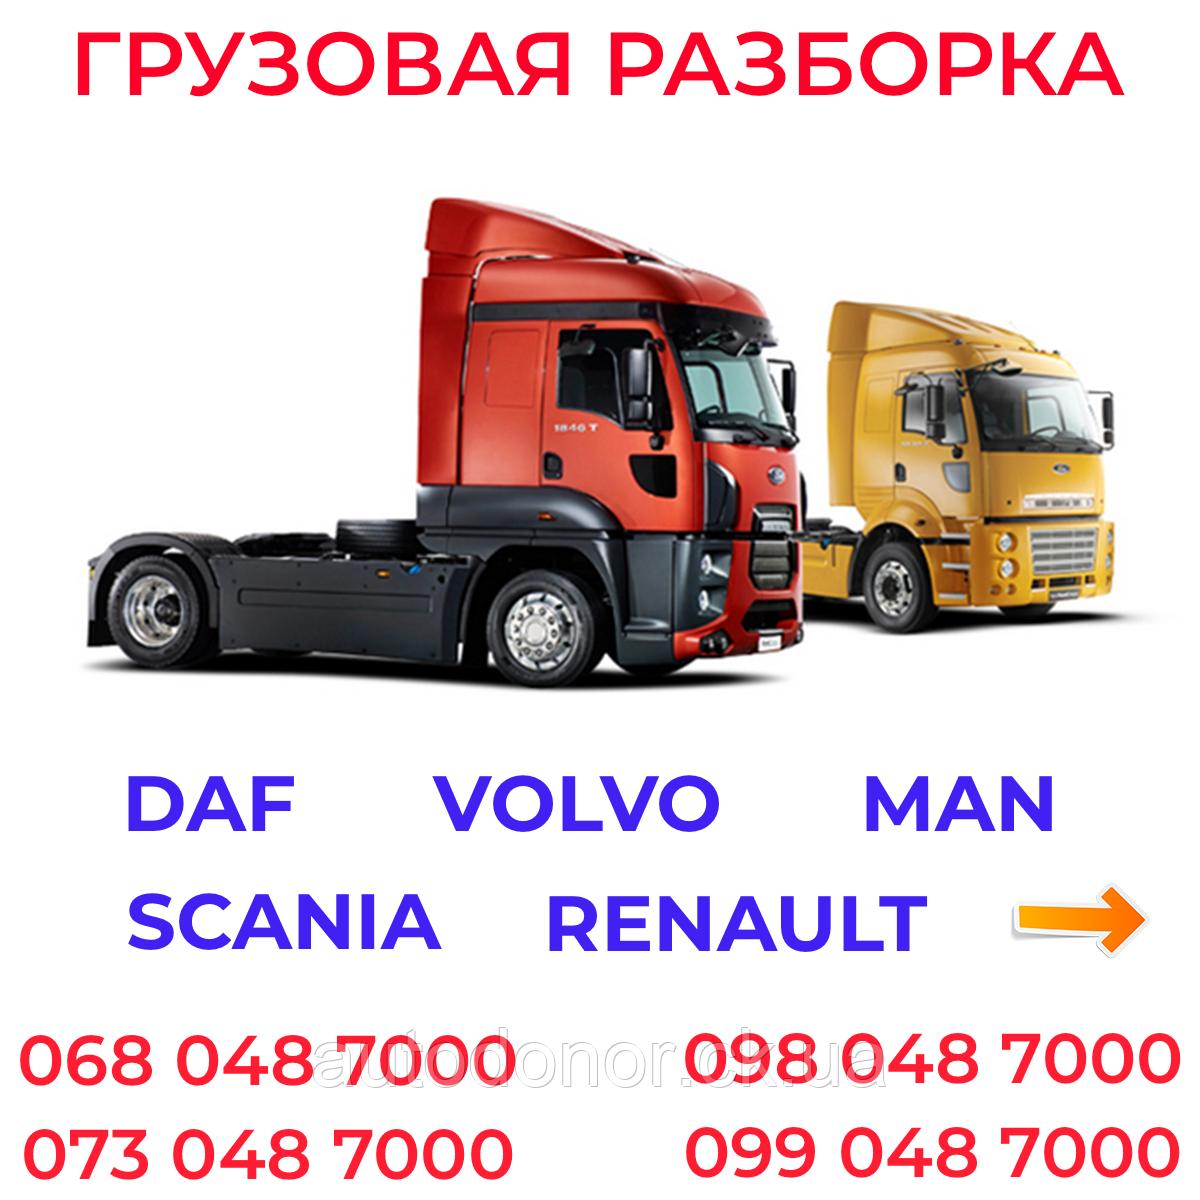 Авторазборка DAF. Грузовая Разборка ДАФ. Разборка грузовых грузовиков и тягачей